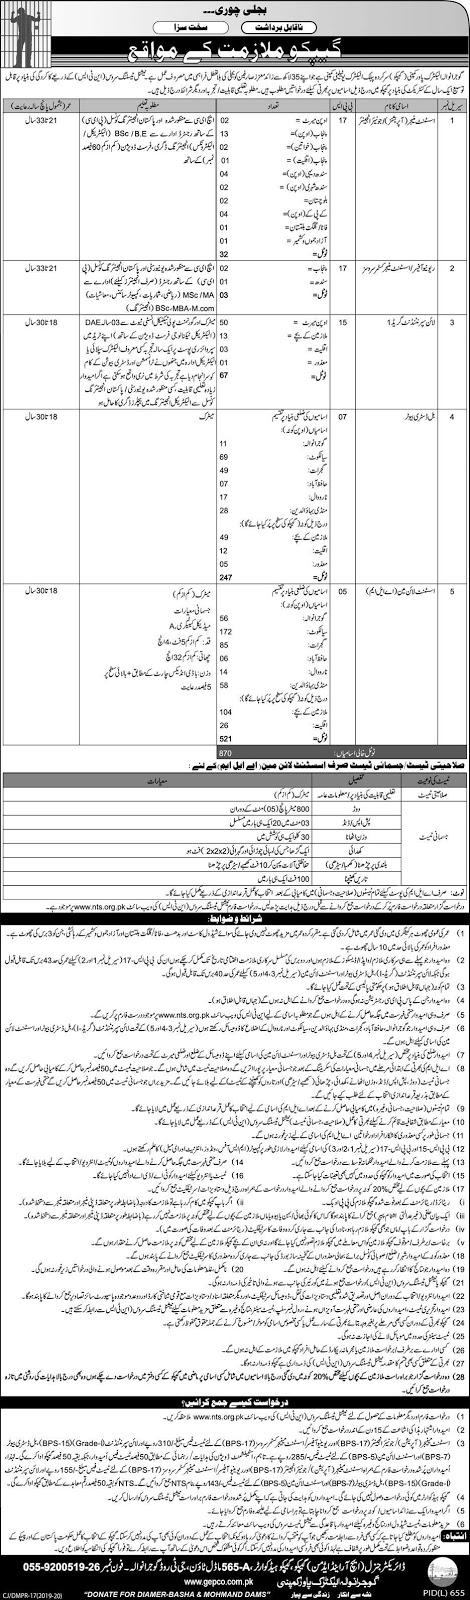 gepco jobs nts application form , jobs in wapda gepco